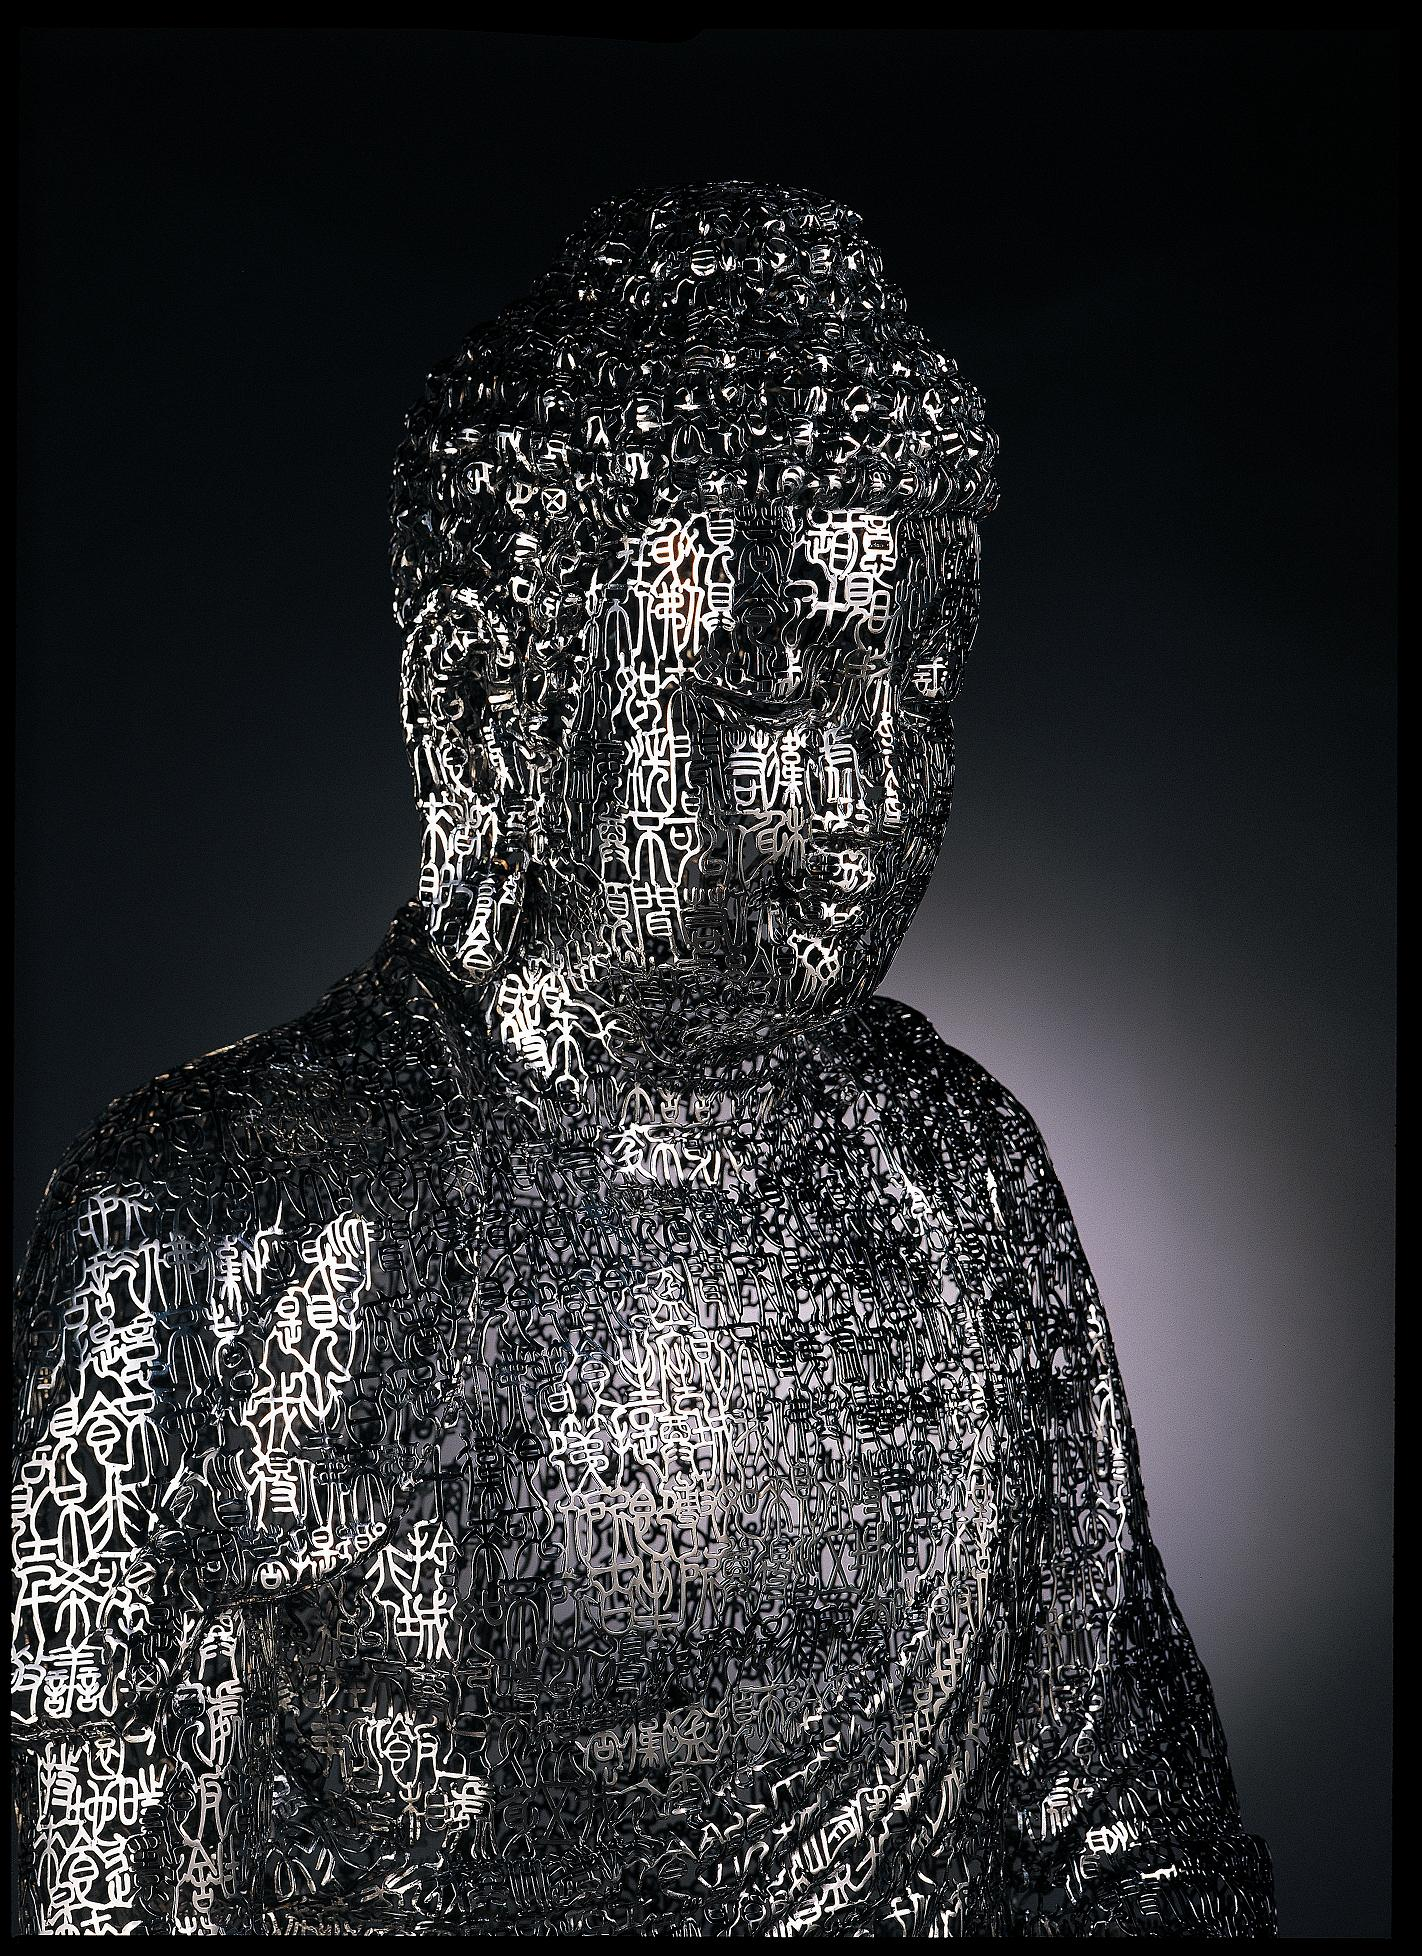 Zheng Lu 郑路, Revelation 闻语心觉, 2008, Stainless steel 不锈钢, 60 x 80 x 100 cm